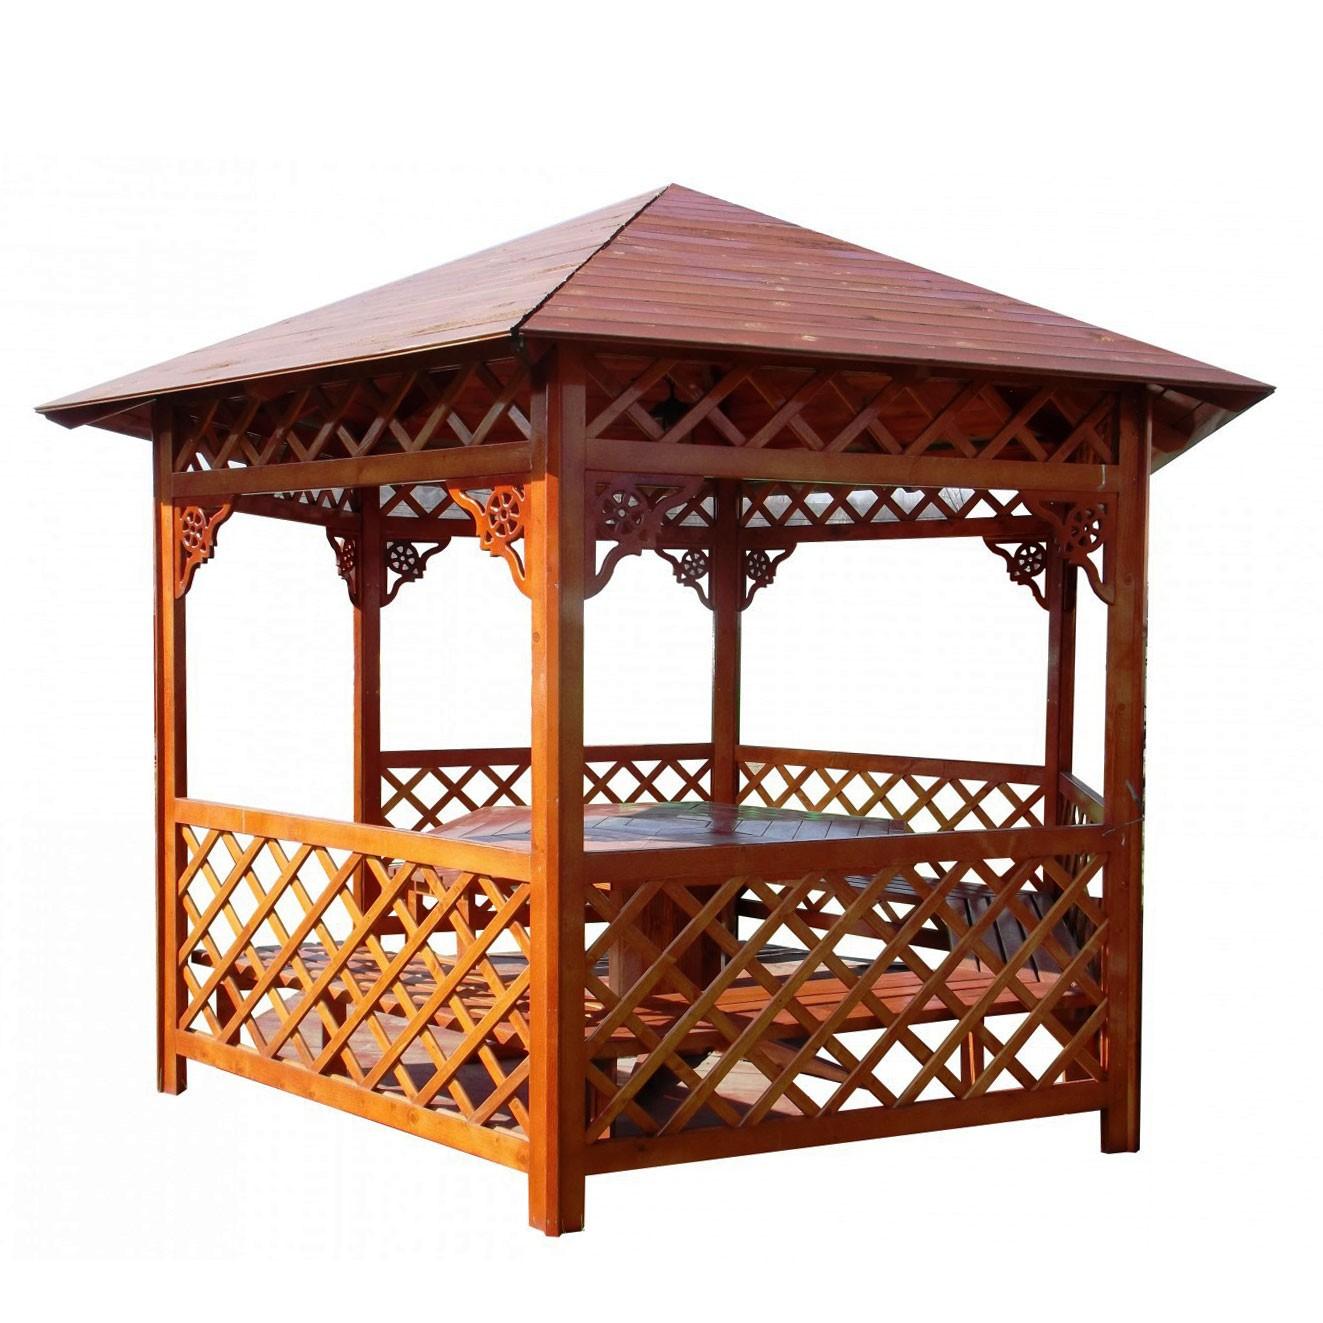 dedeman pavilion hexagonal din lemn 3 5 x 4 x 3 2 m dedicat planurilor tale. Black Bedroom Furniture Sets. Home Design Ideas